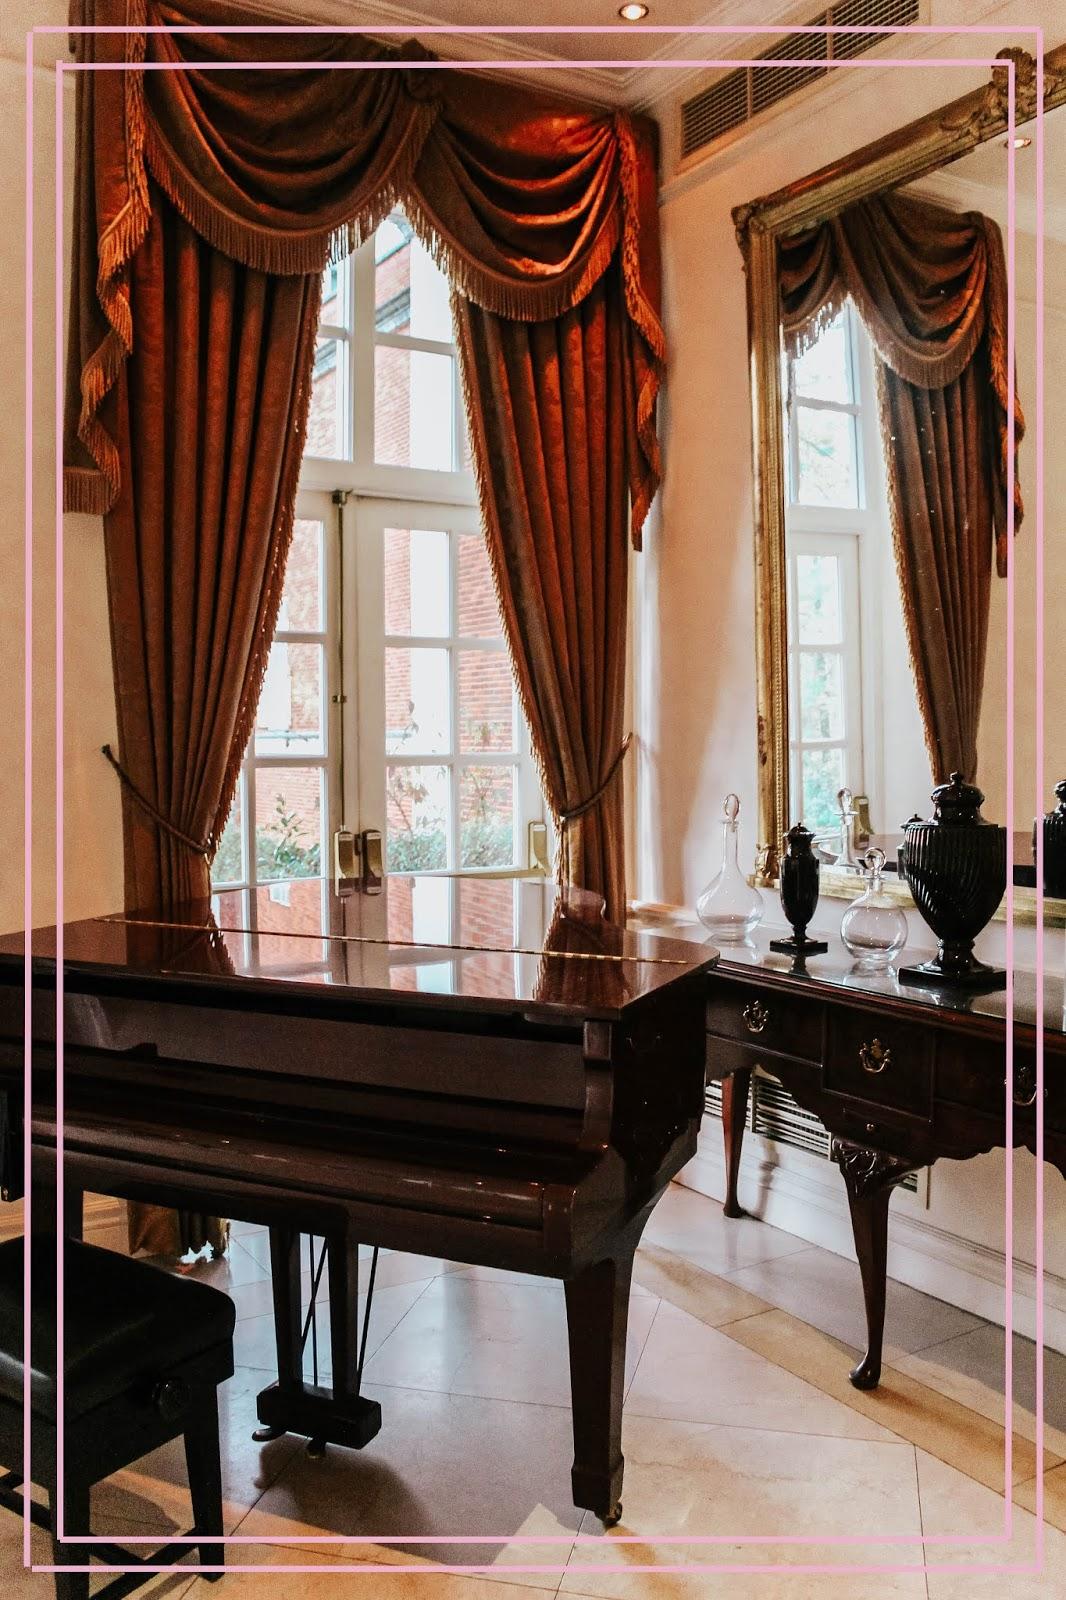 Four Seasons Hampshire Luxury Hotel Grand Piano